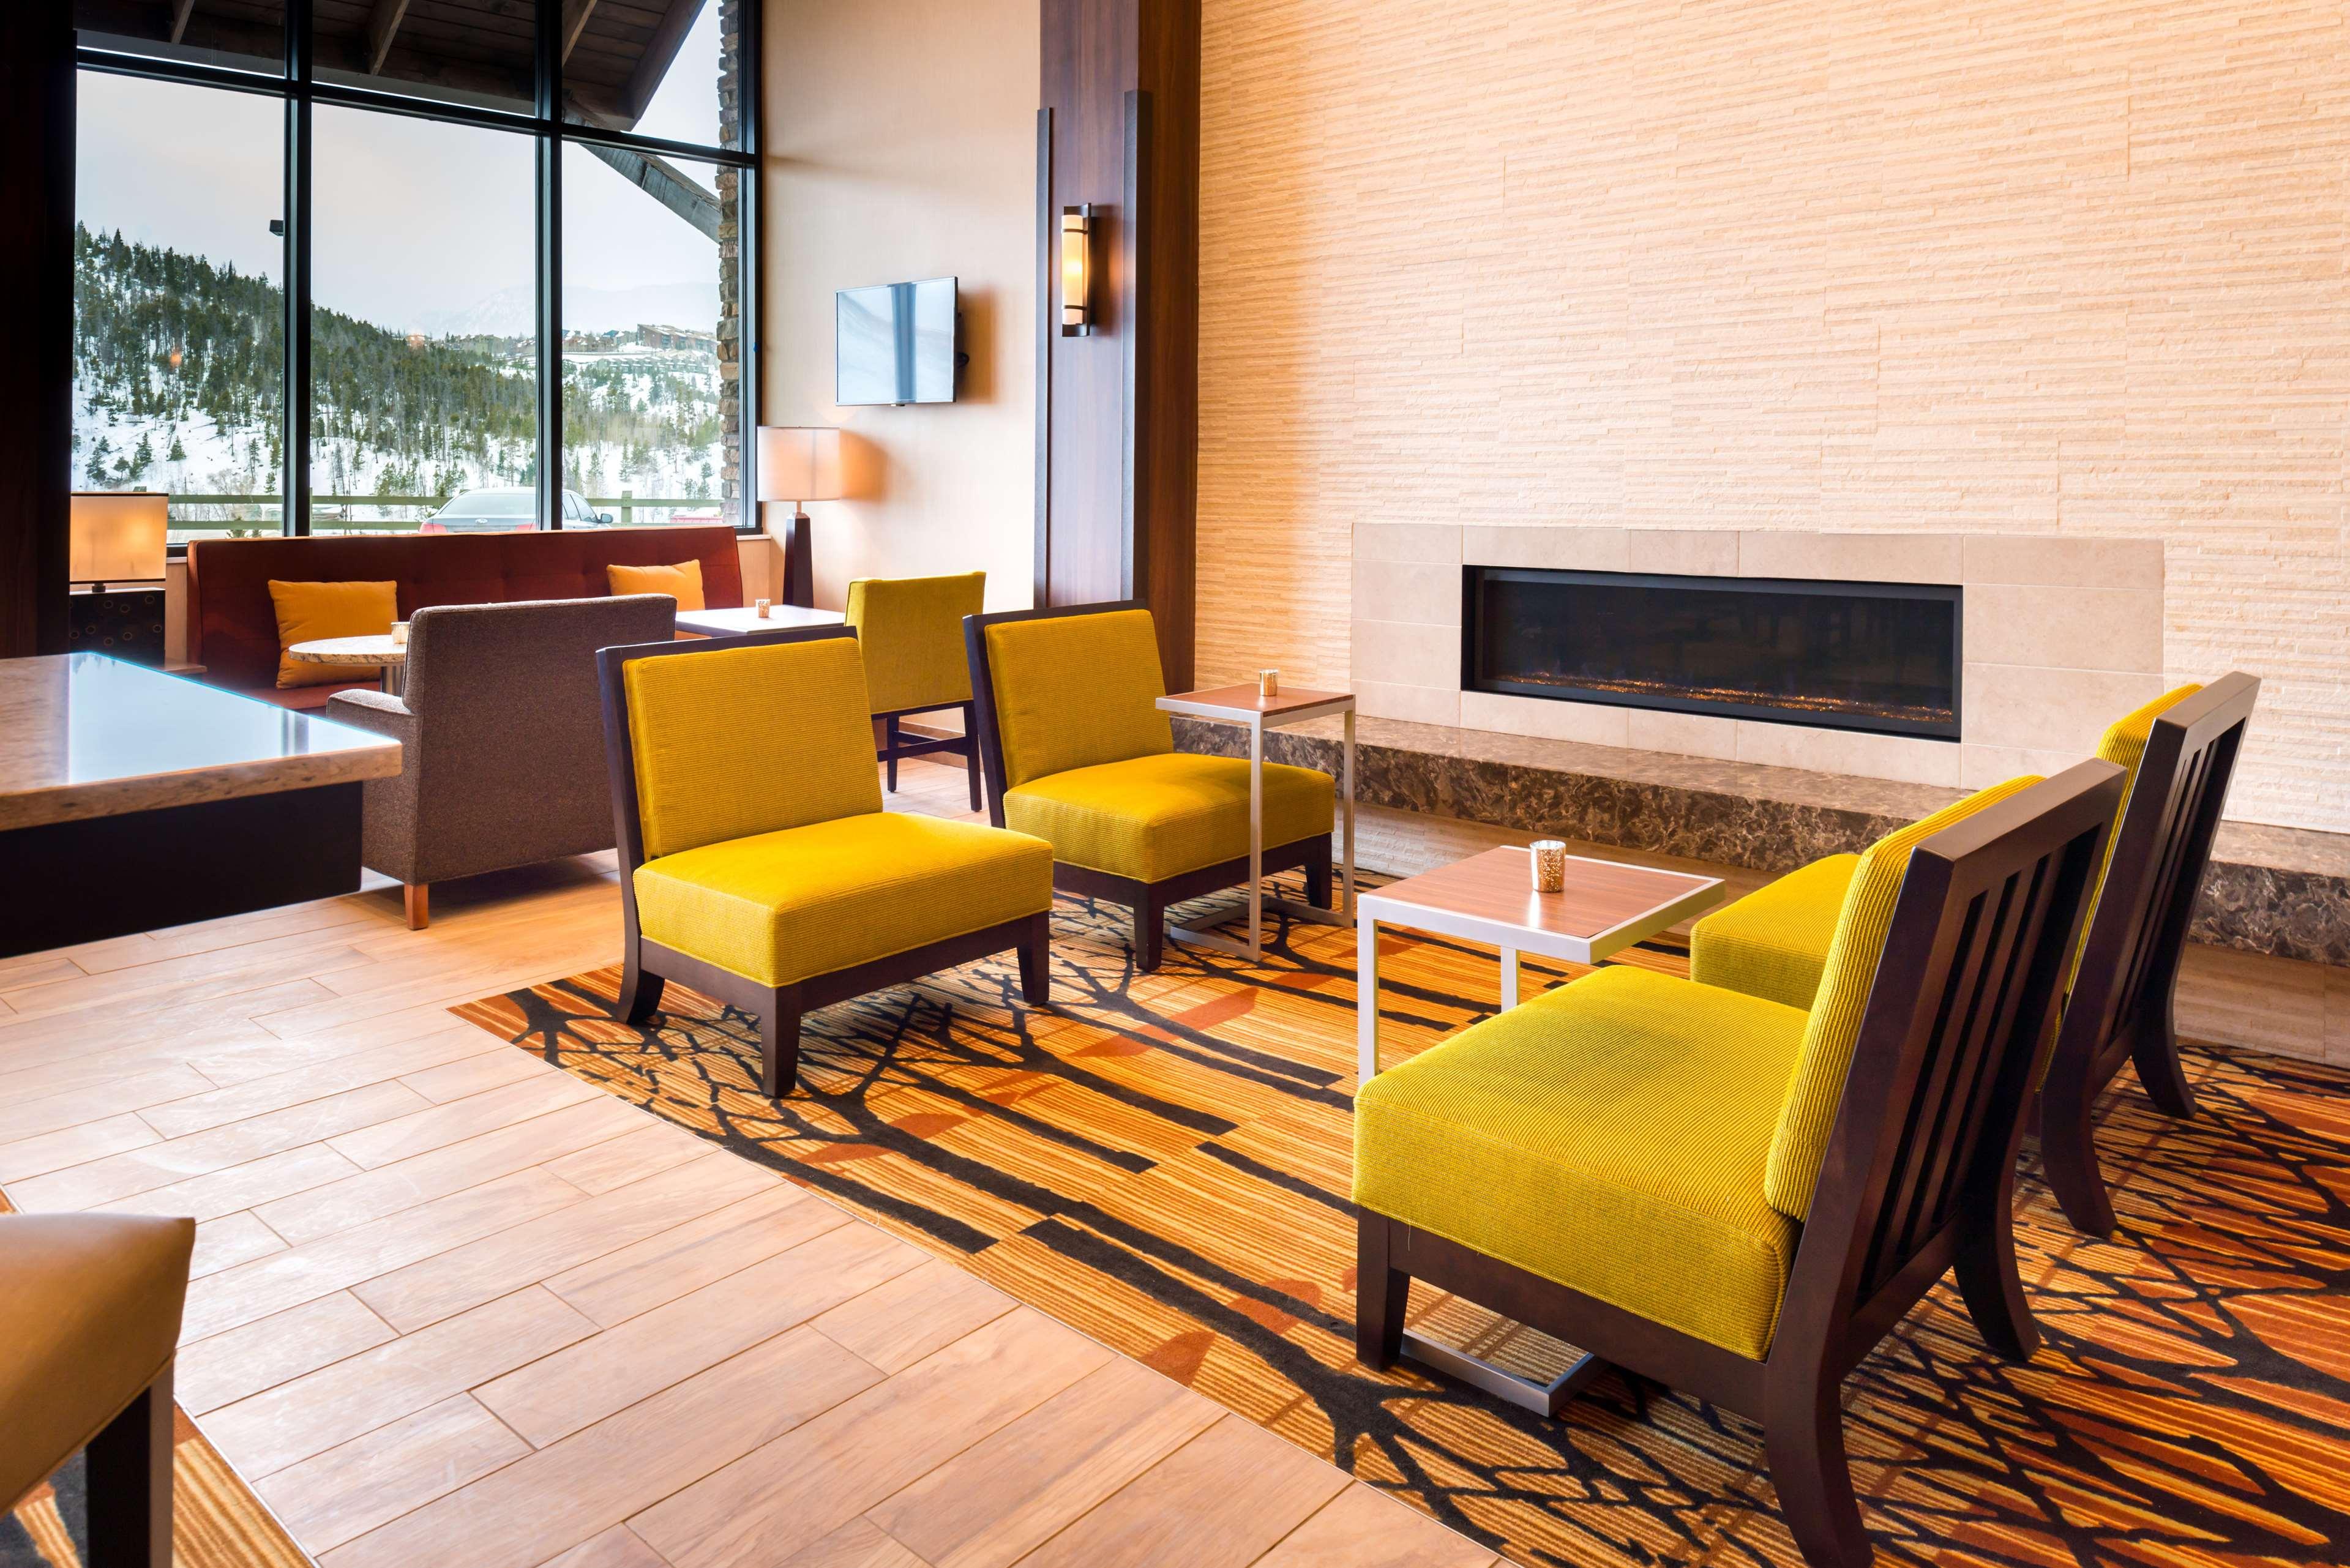 Hampton Inn & Suites Silverthorne image 3